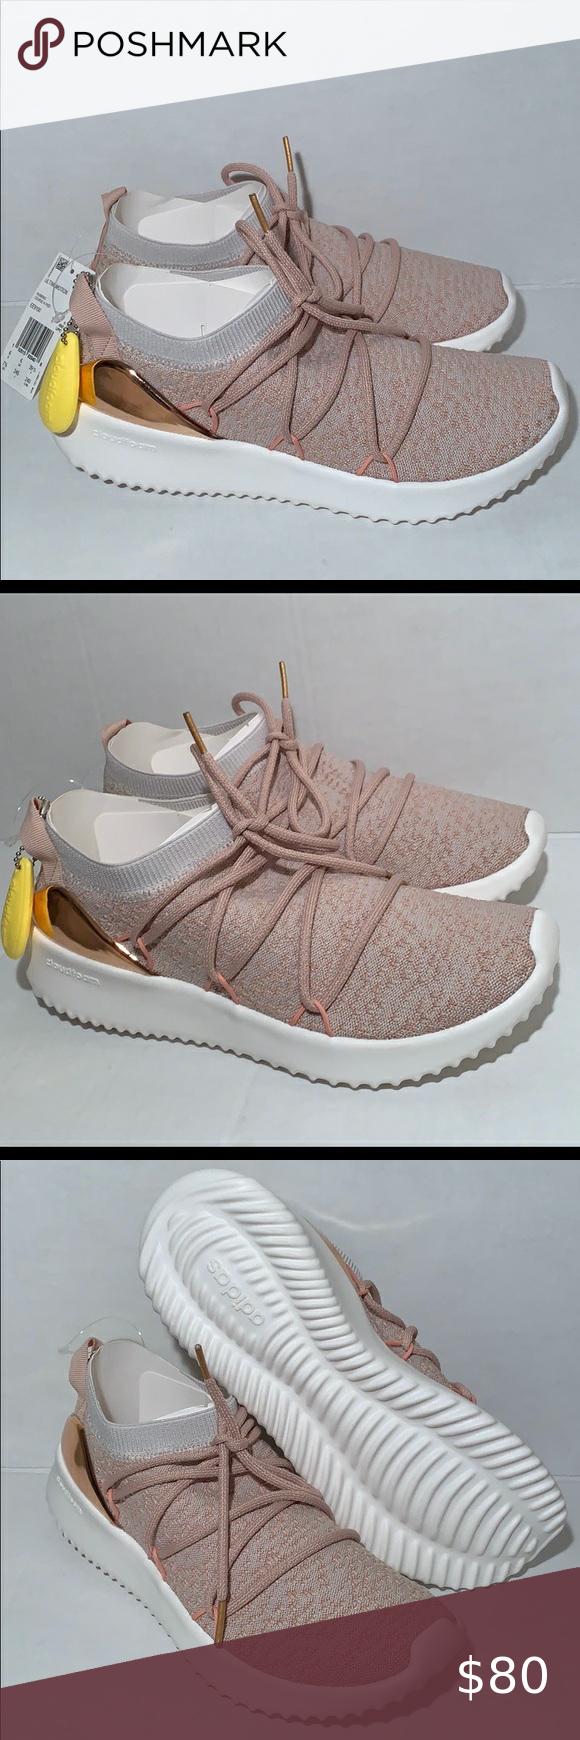 rose gold cloudfoam adidas